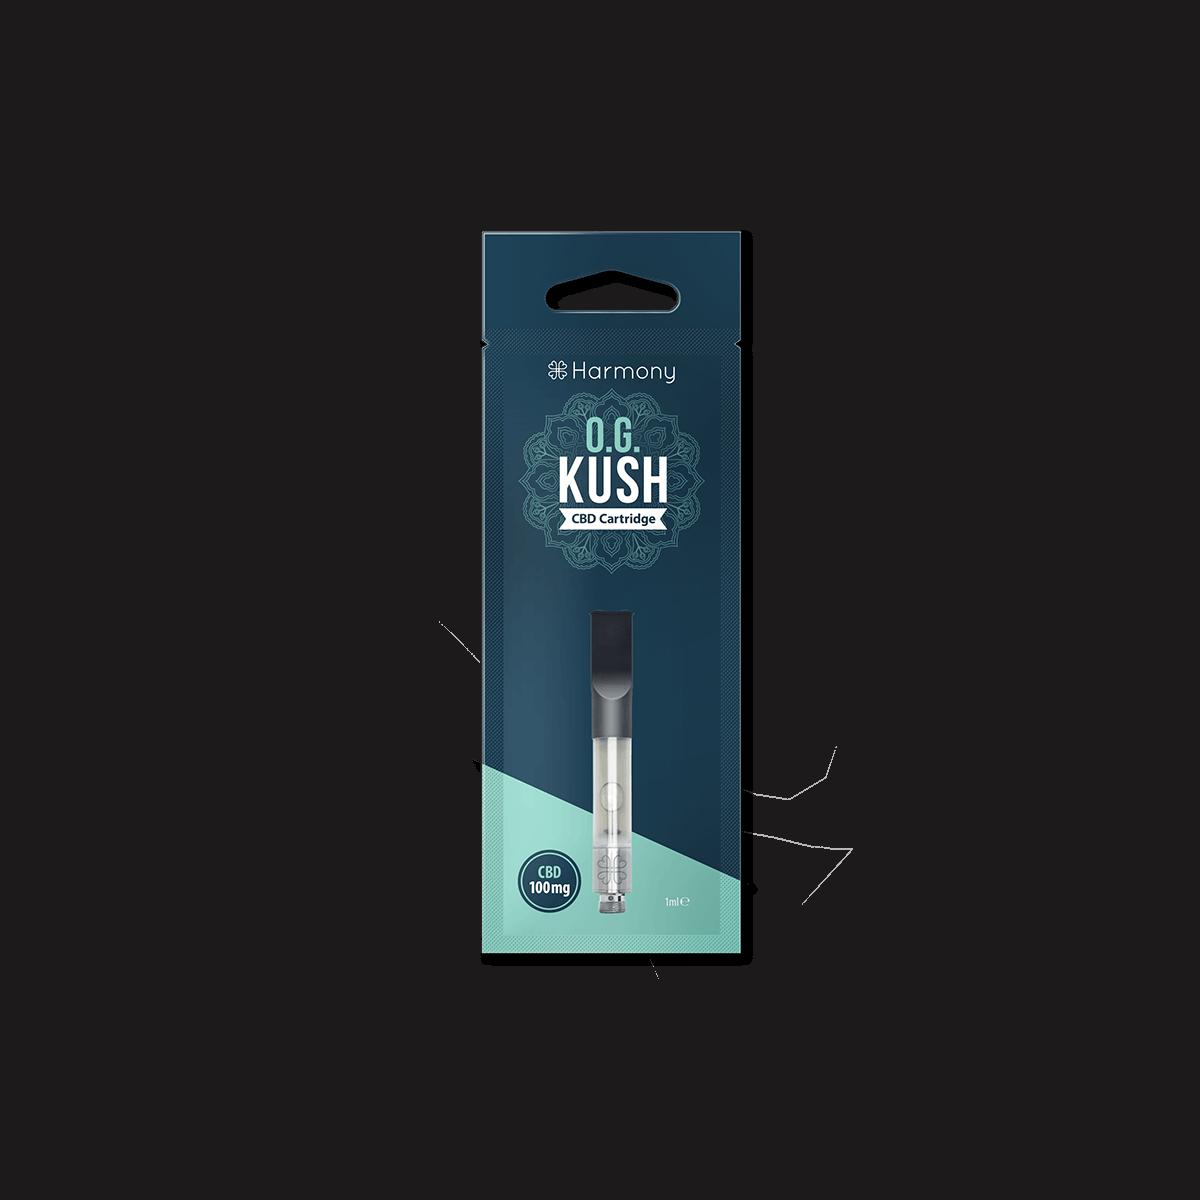 HARMONY Pen Vaporizer - O.G. Kush | 1ml - 100mg CBD - Nur Patrone